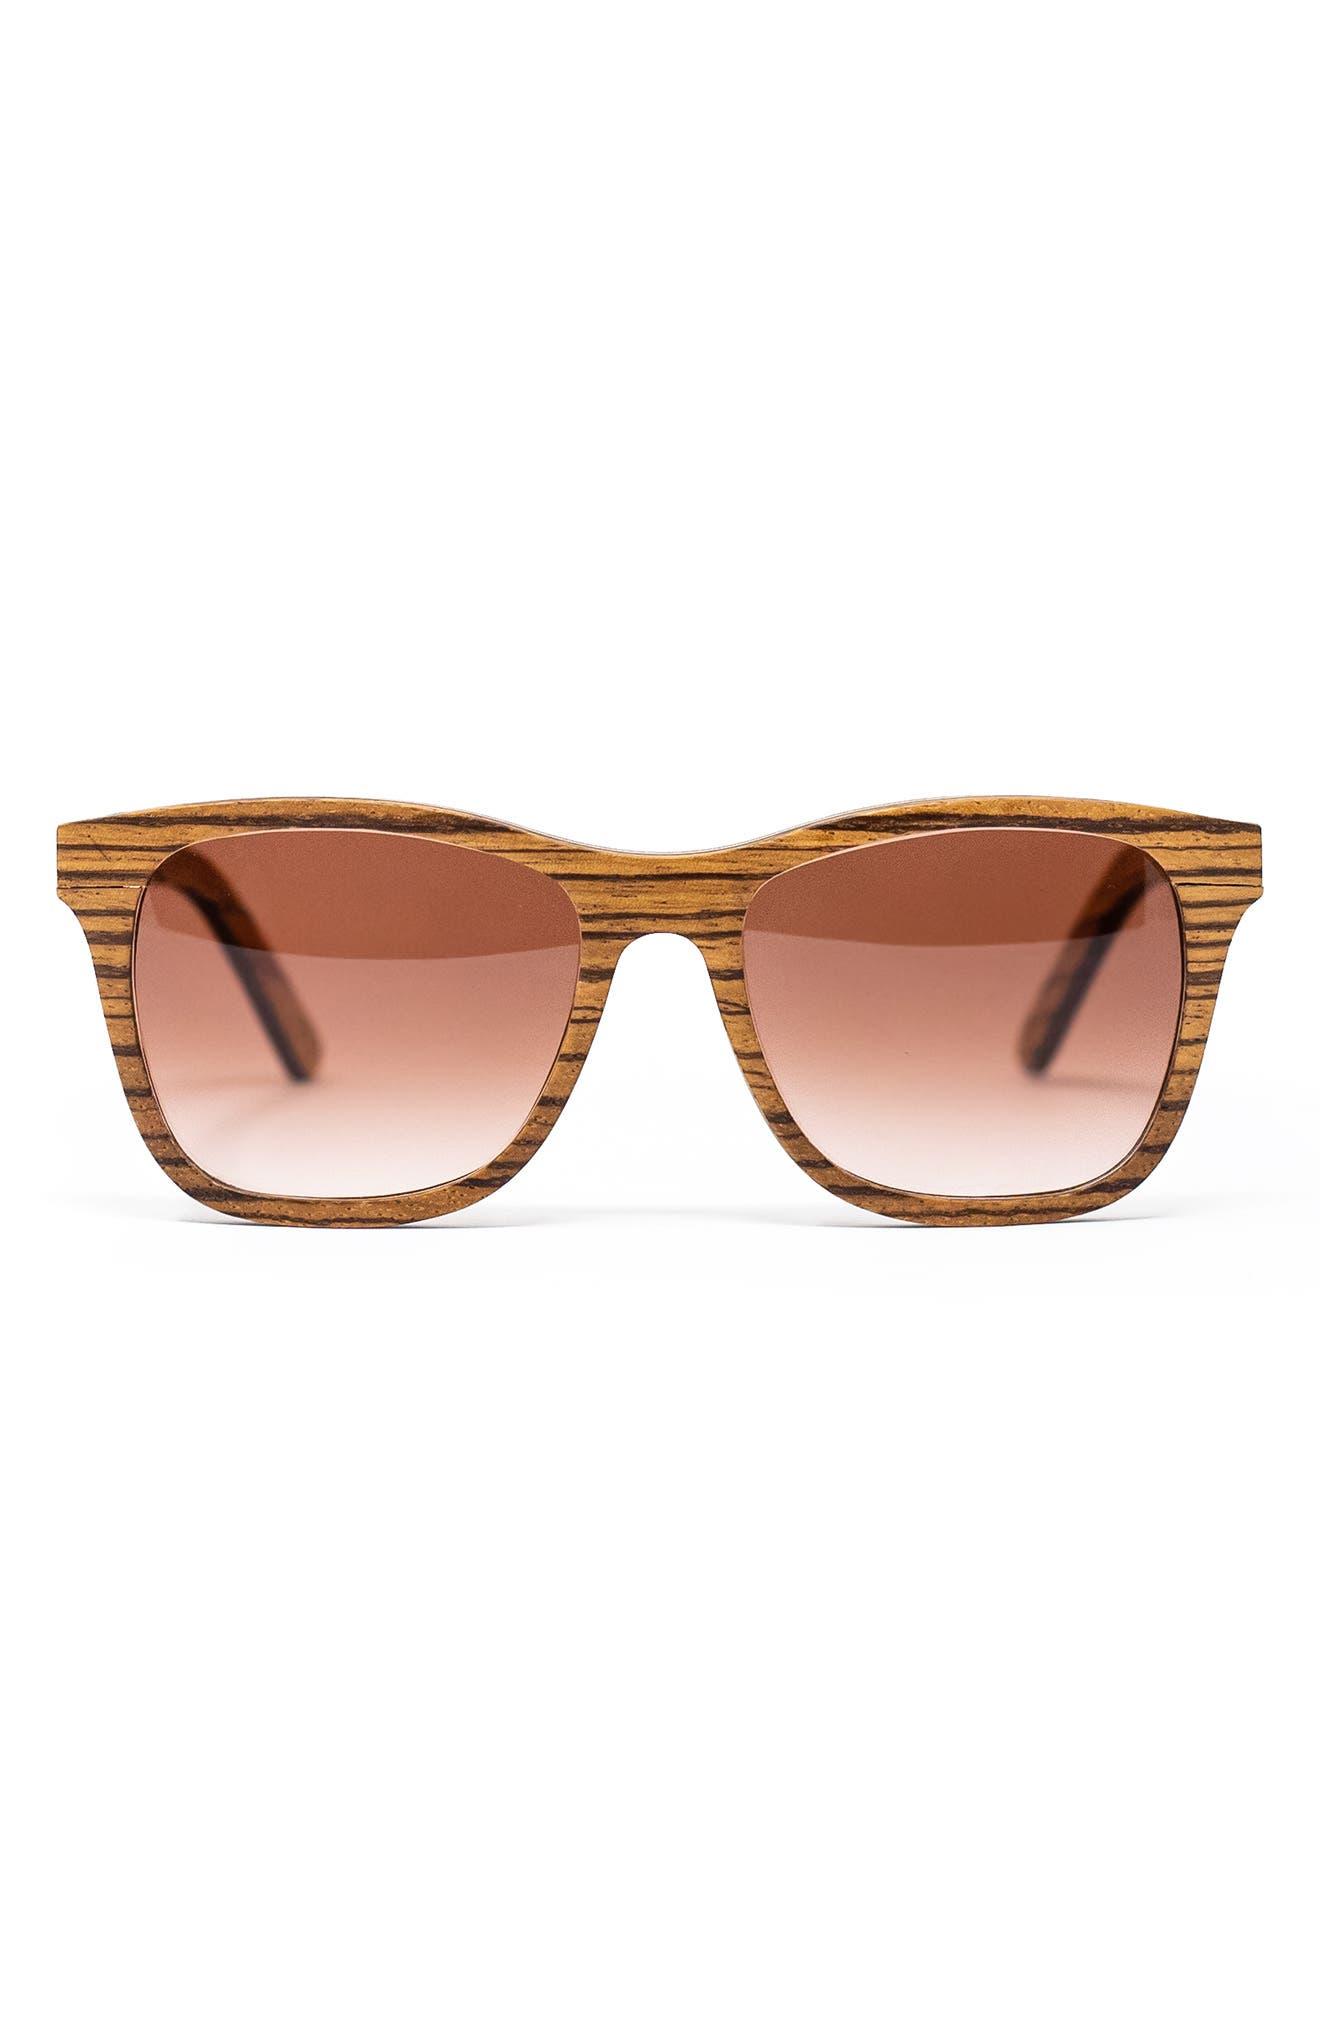 Barklae 51mm Gradient Square Zebrawood Blue Light Blocking Sunglasses